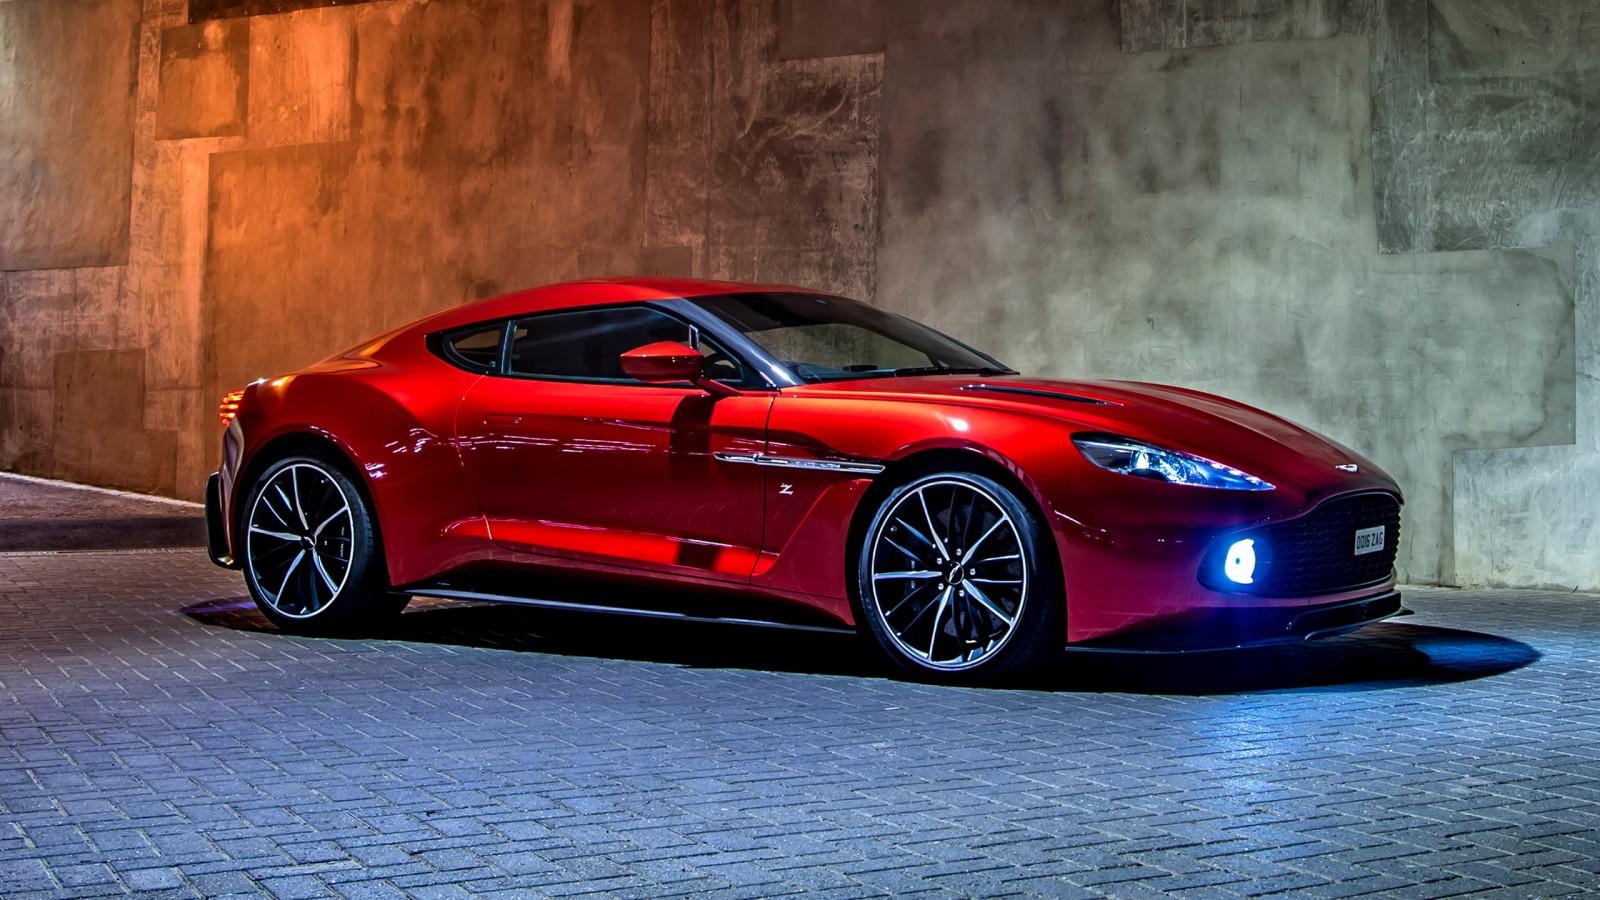 Aston Martin Vanquish Zagato Wallpapers Hd Wallpapers